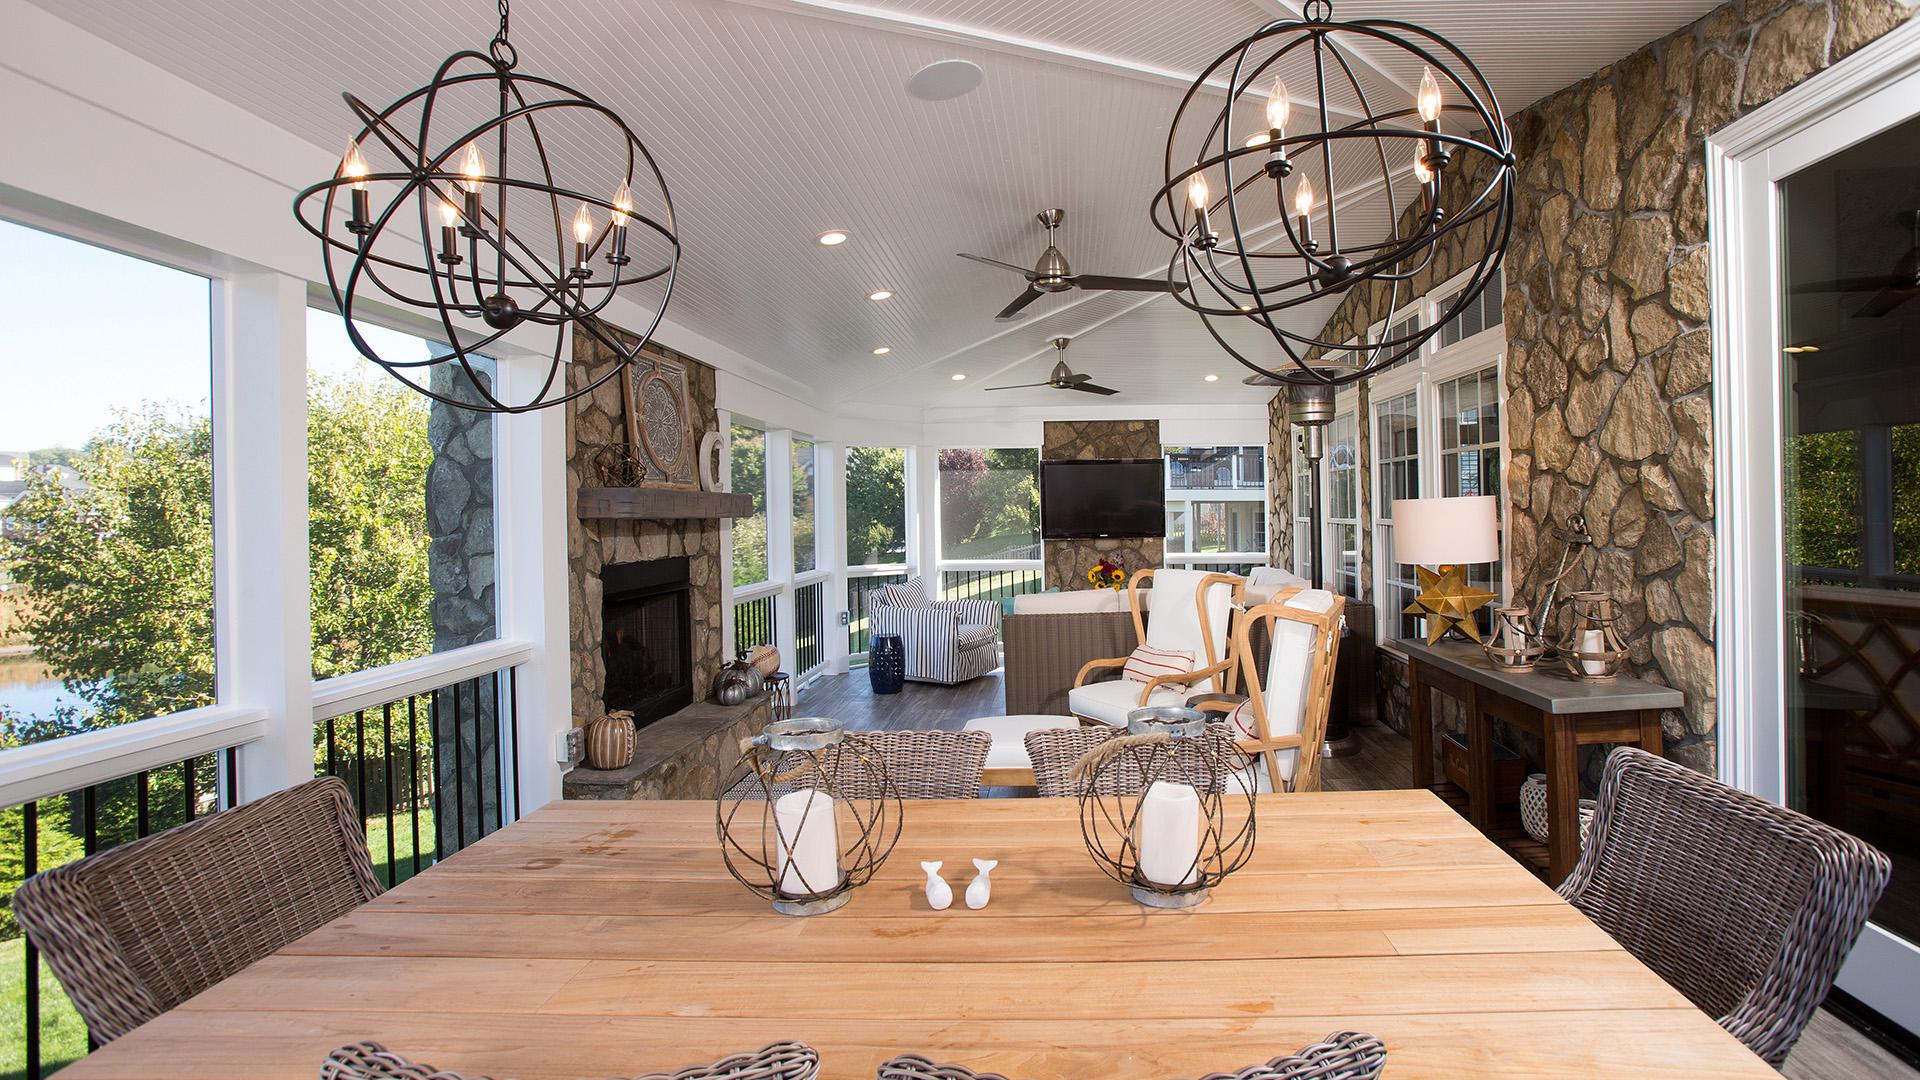 2018 Professional Remodeler Design Awards, Bronze Award Winner, Outdoor Living over $100,000